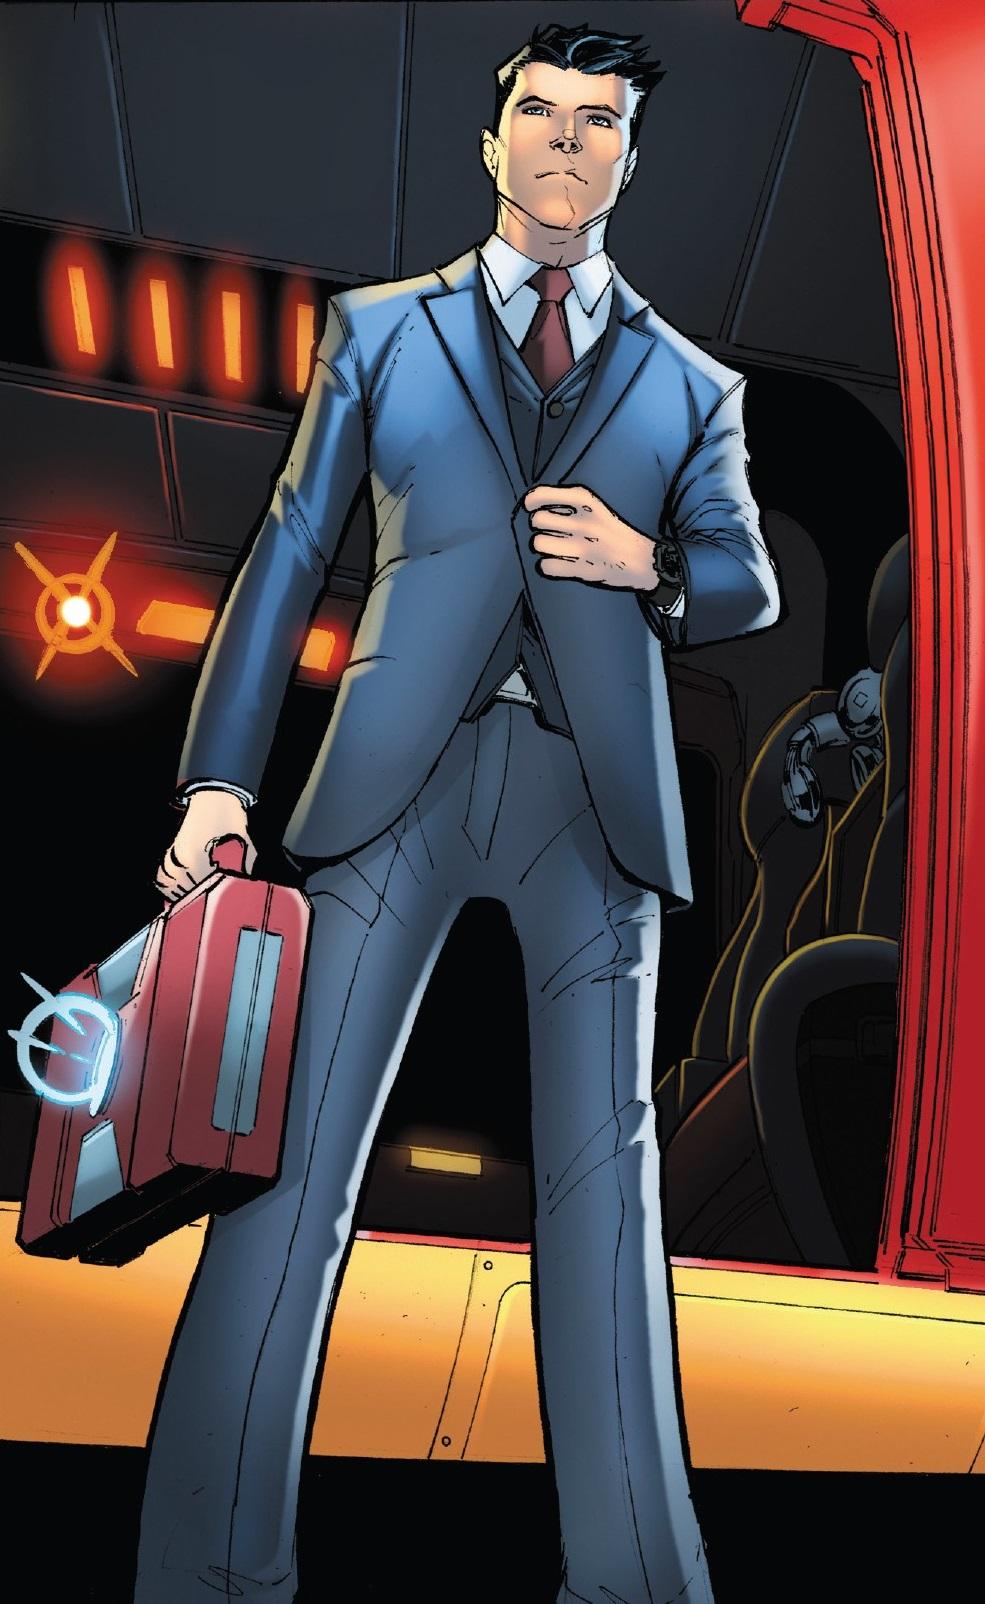 Arno Stark (Earth-616) | Marvel Database | FANDOM powered by